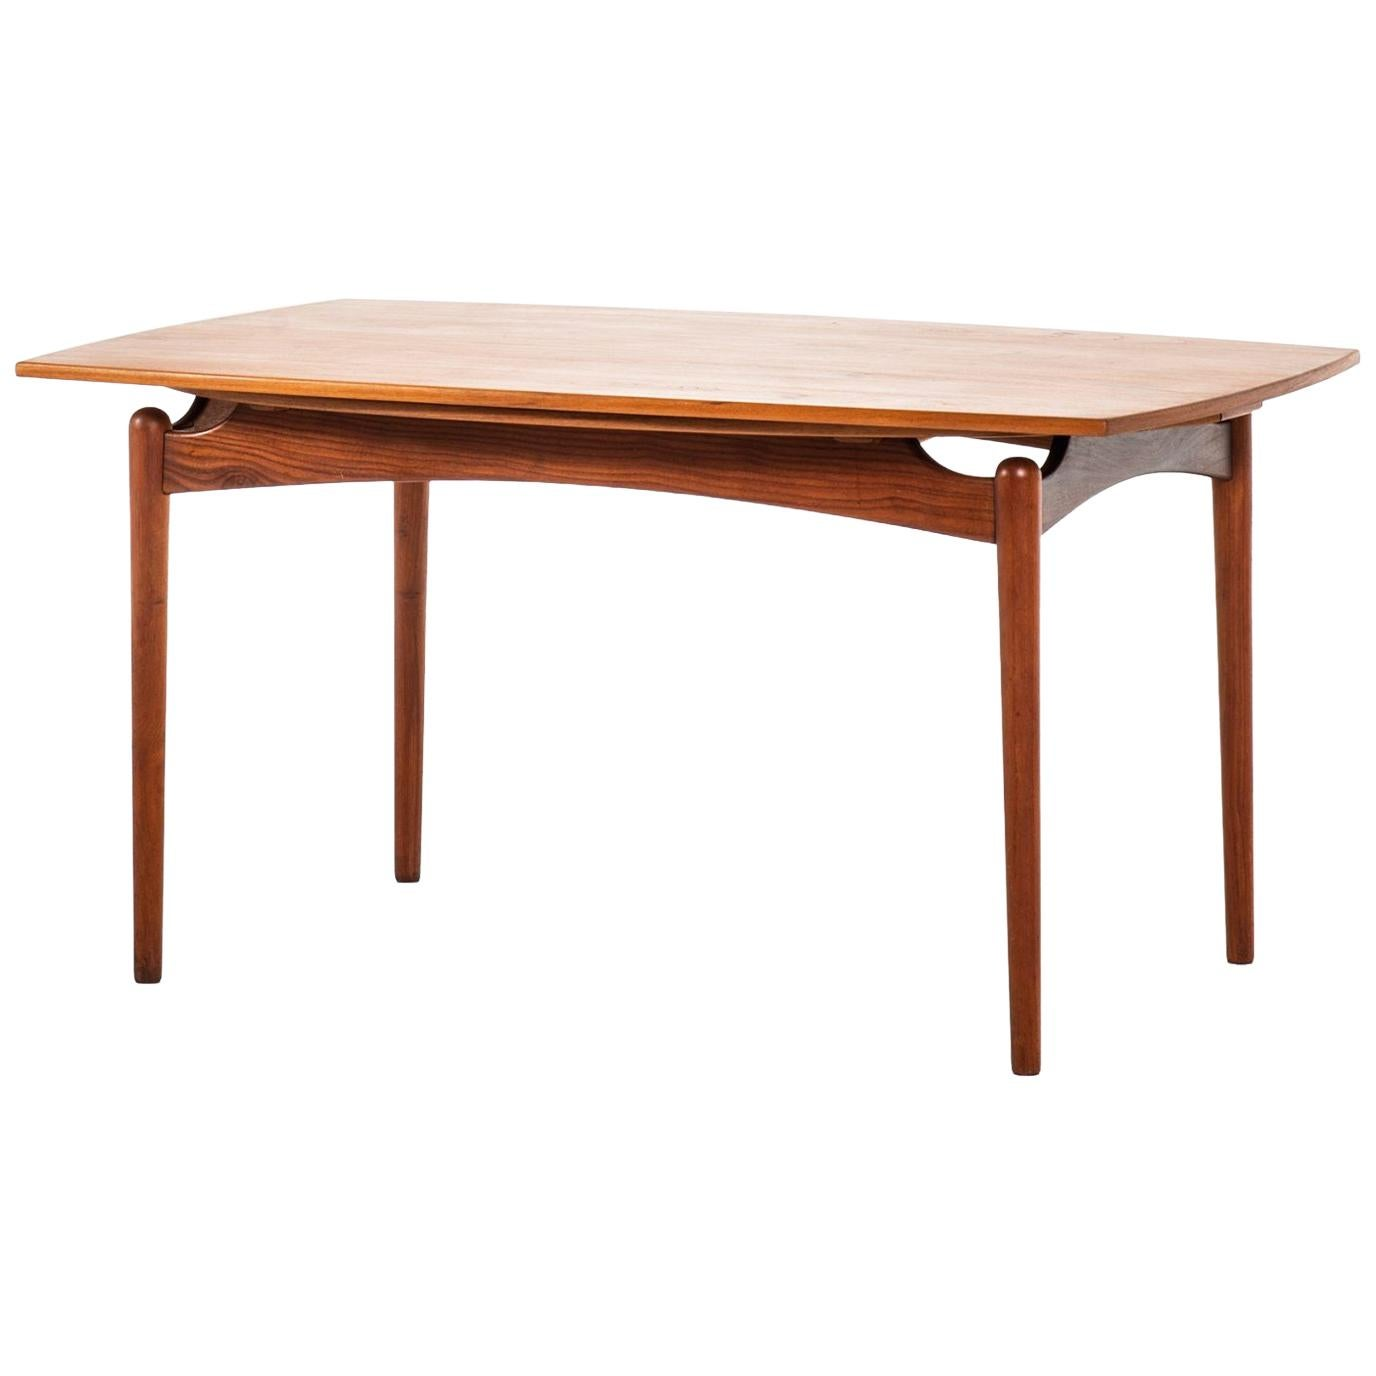 Dining Table in the Style of Finn Juhl Produced in Denmark